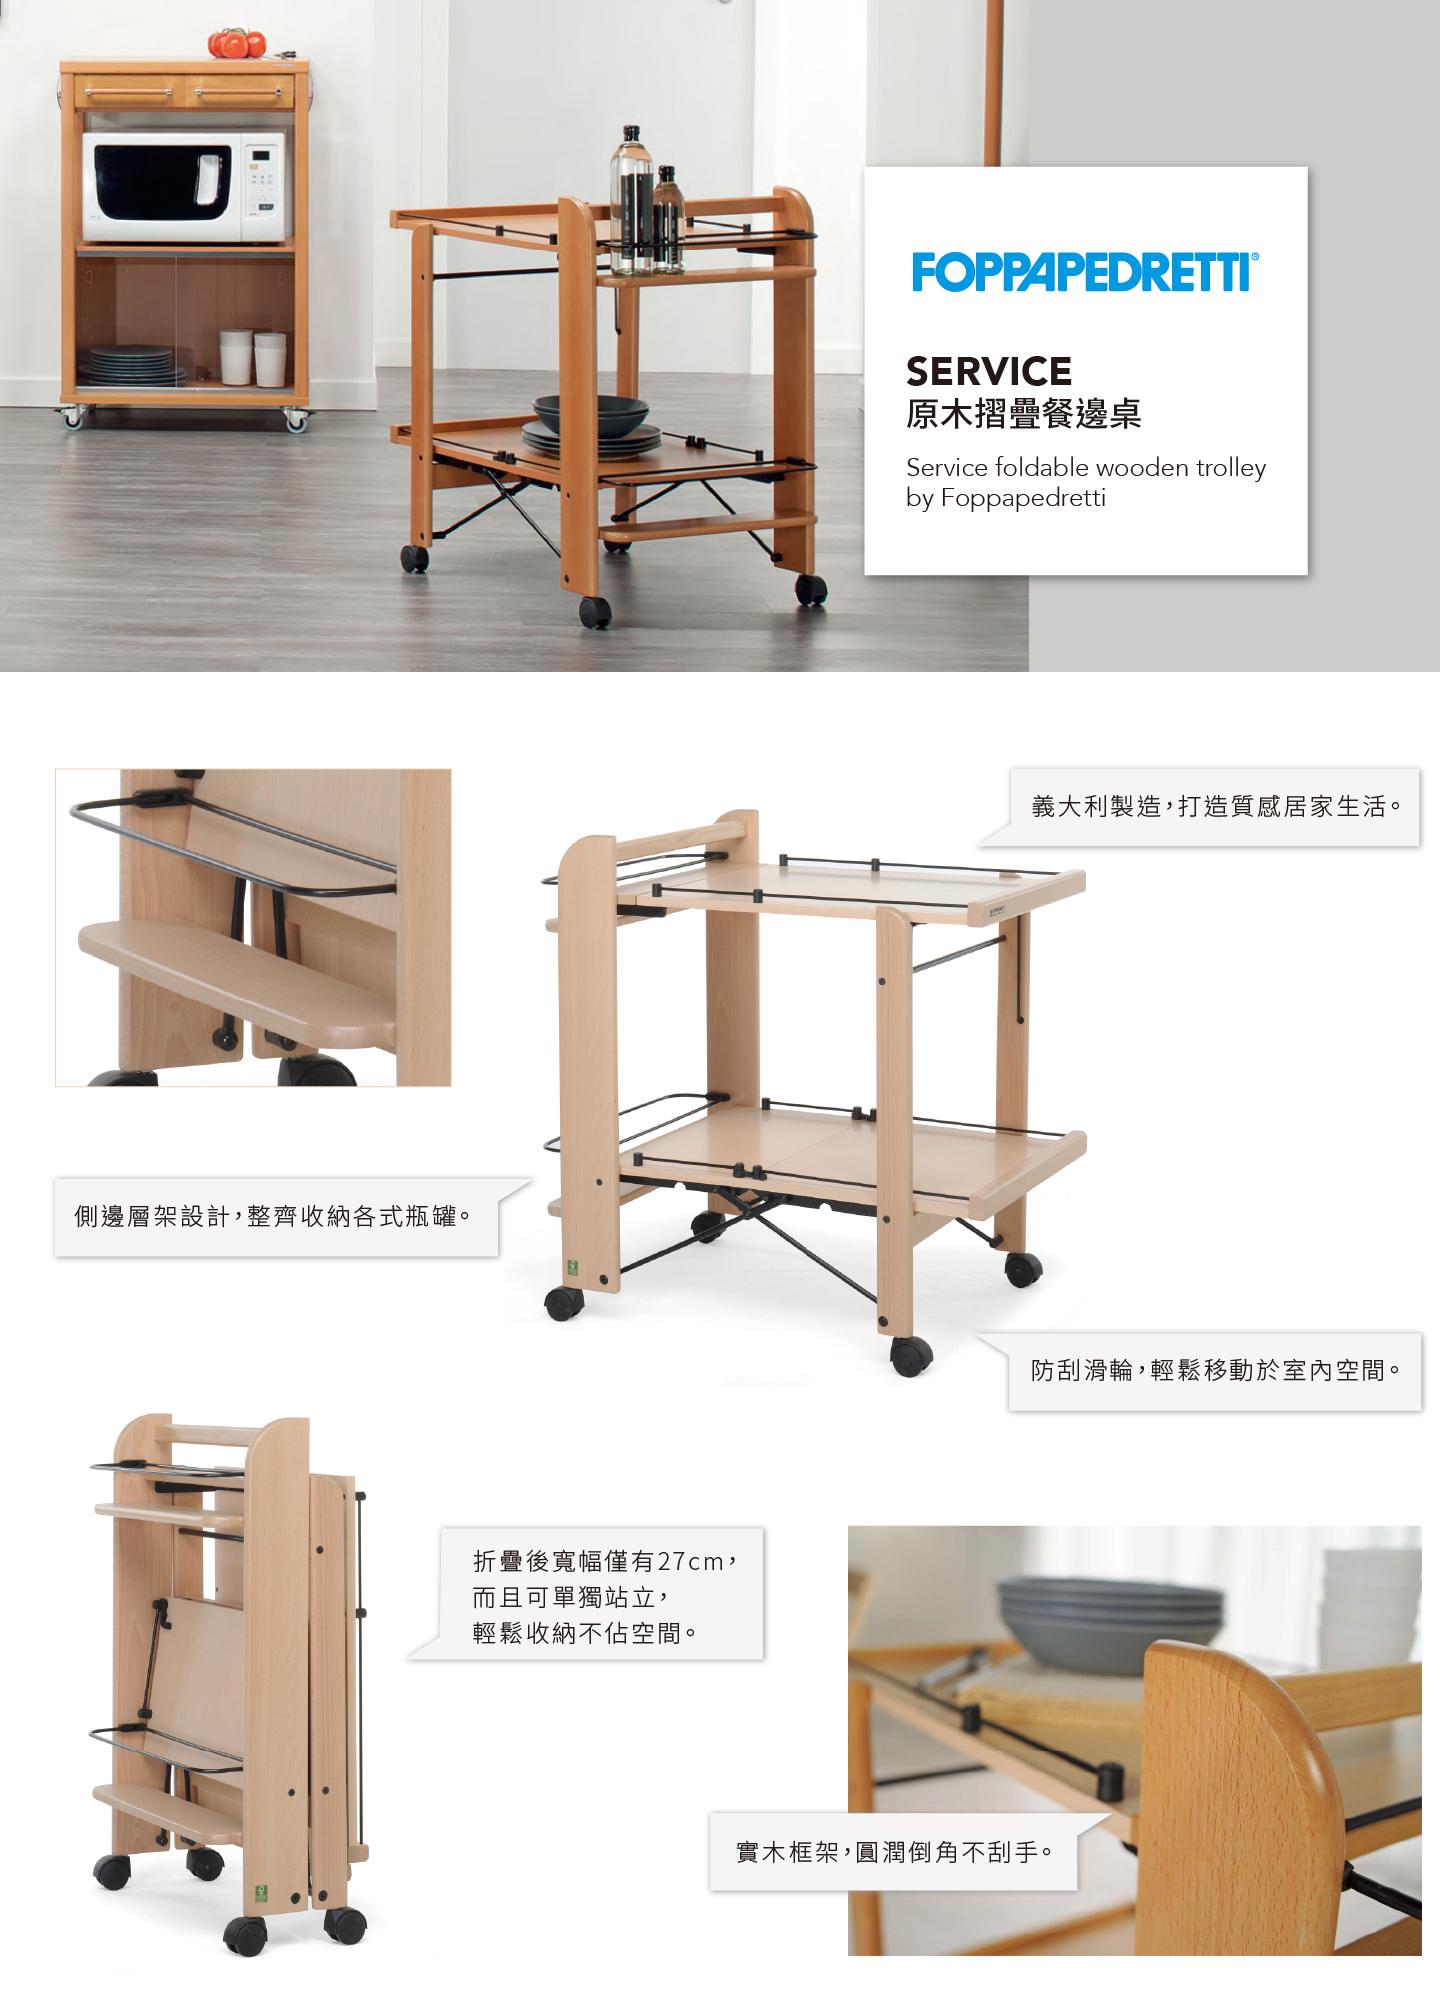 Fopp-Service